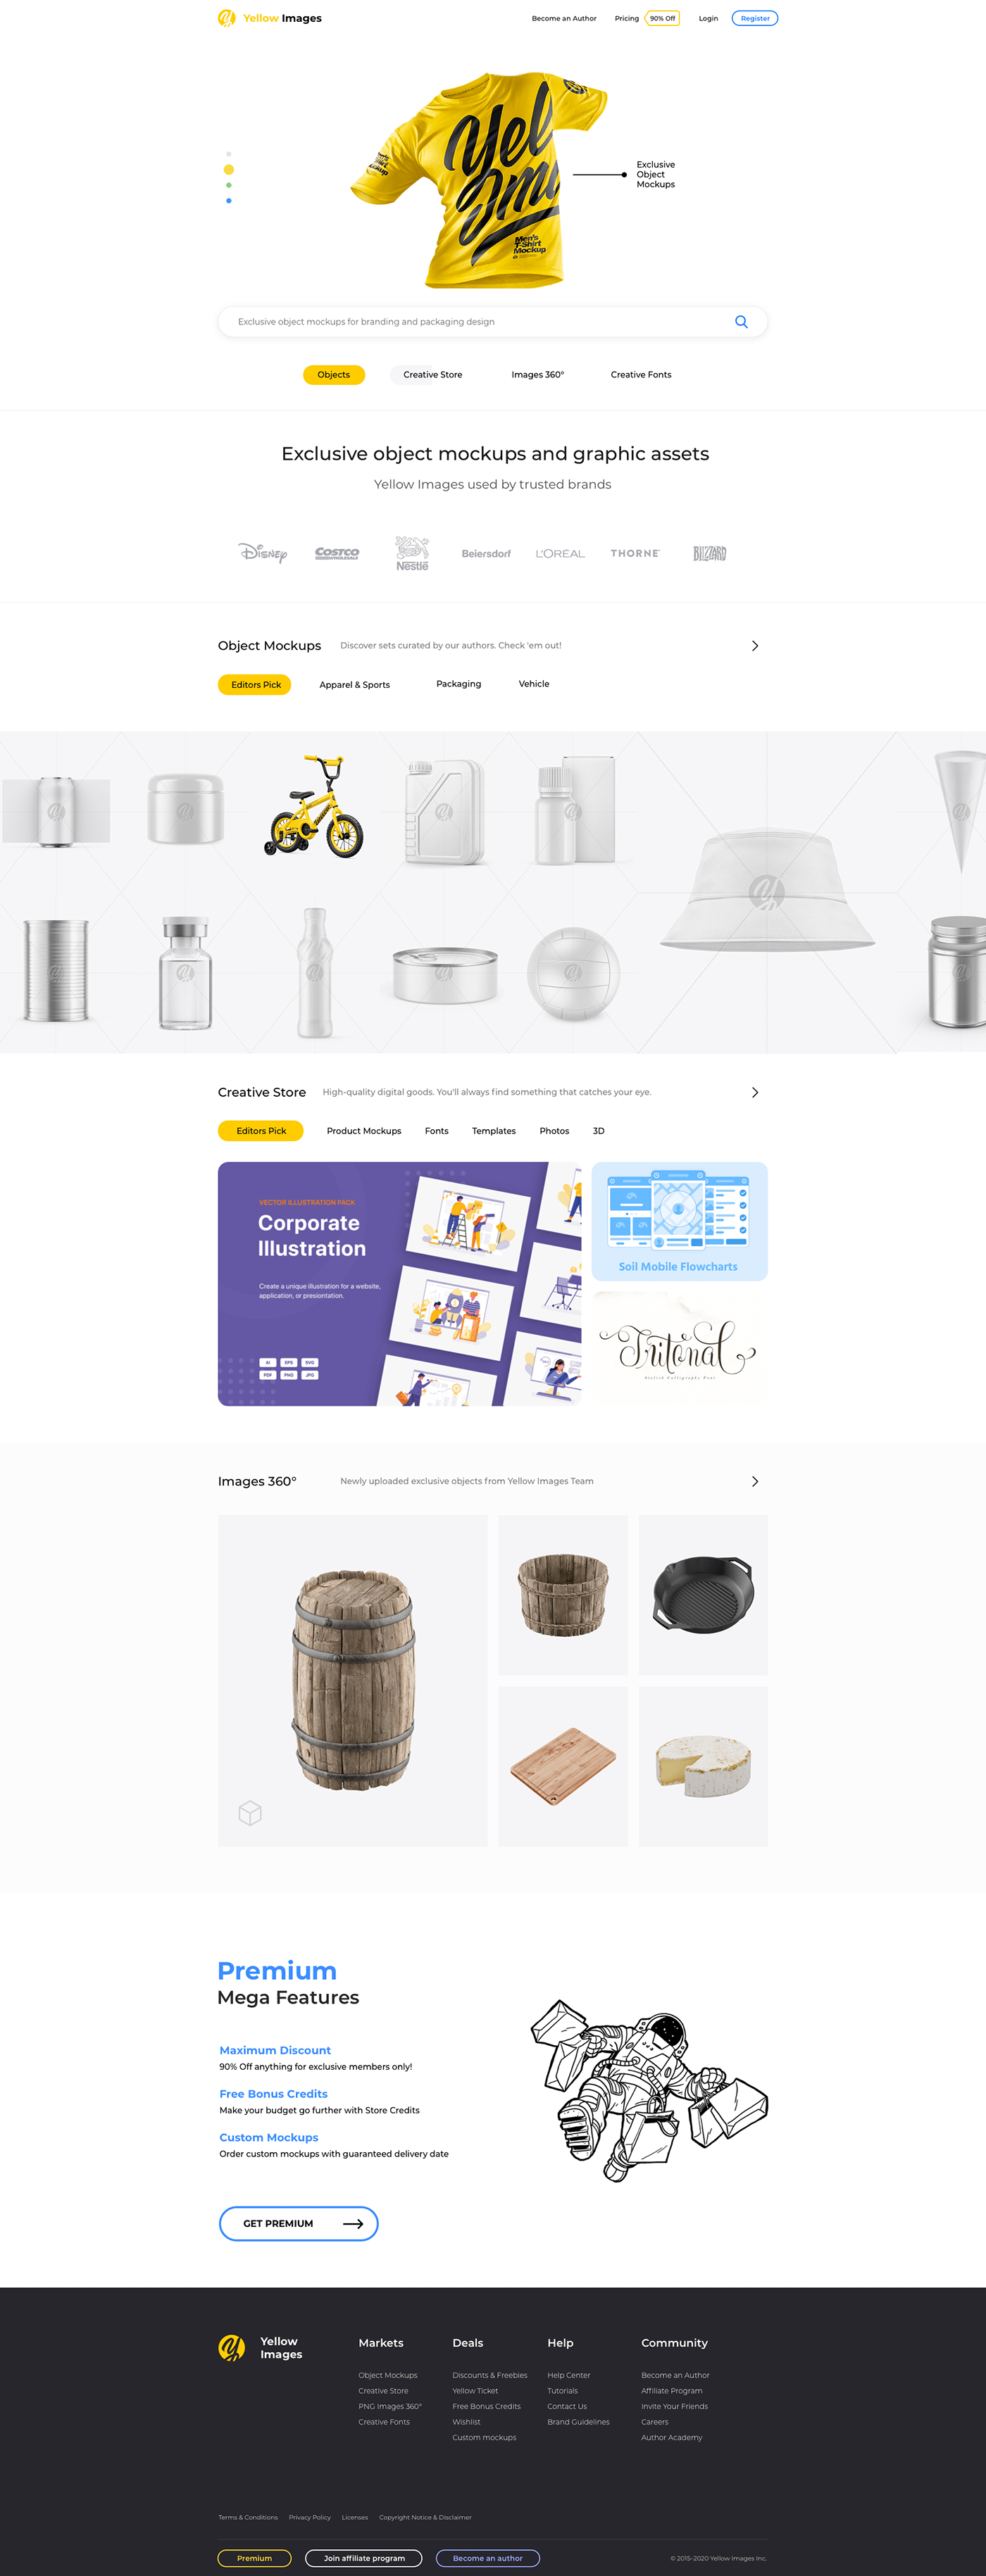 Interface UI